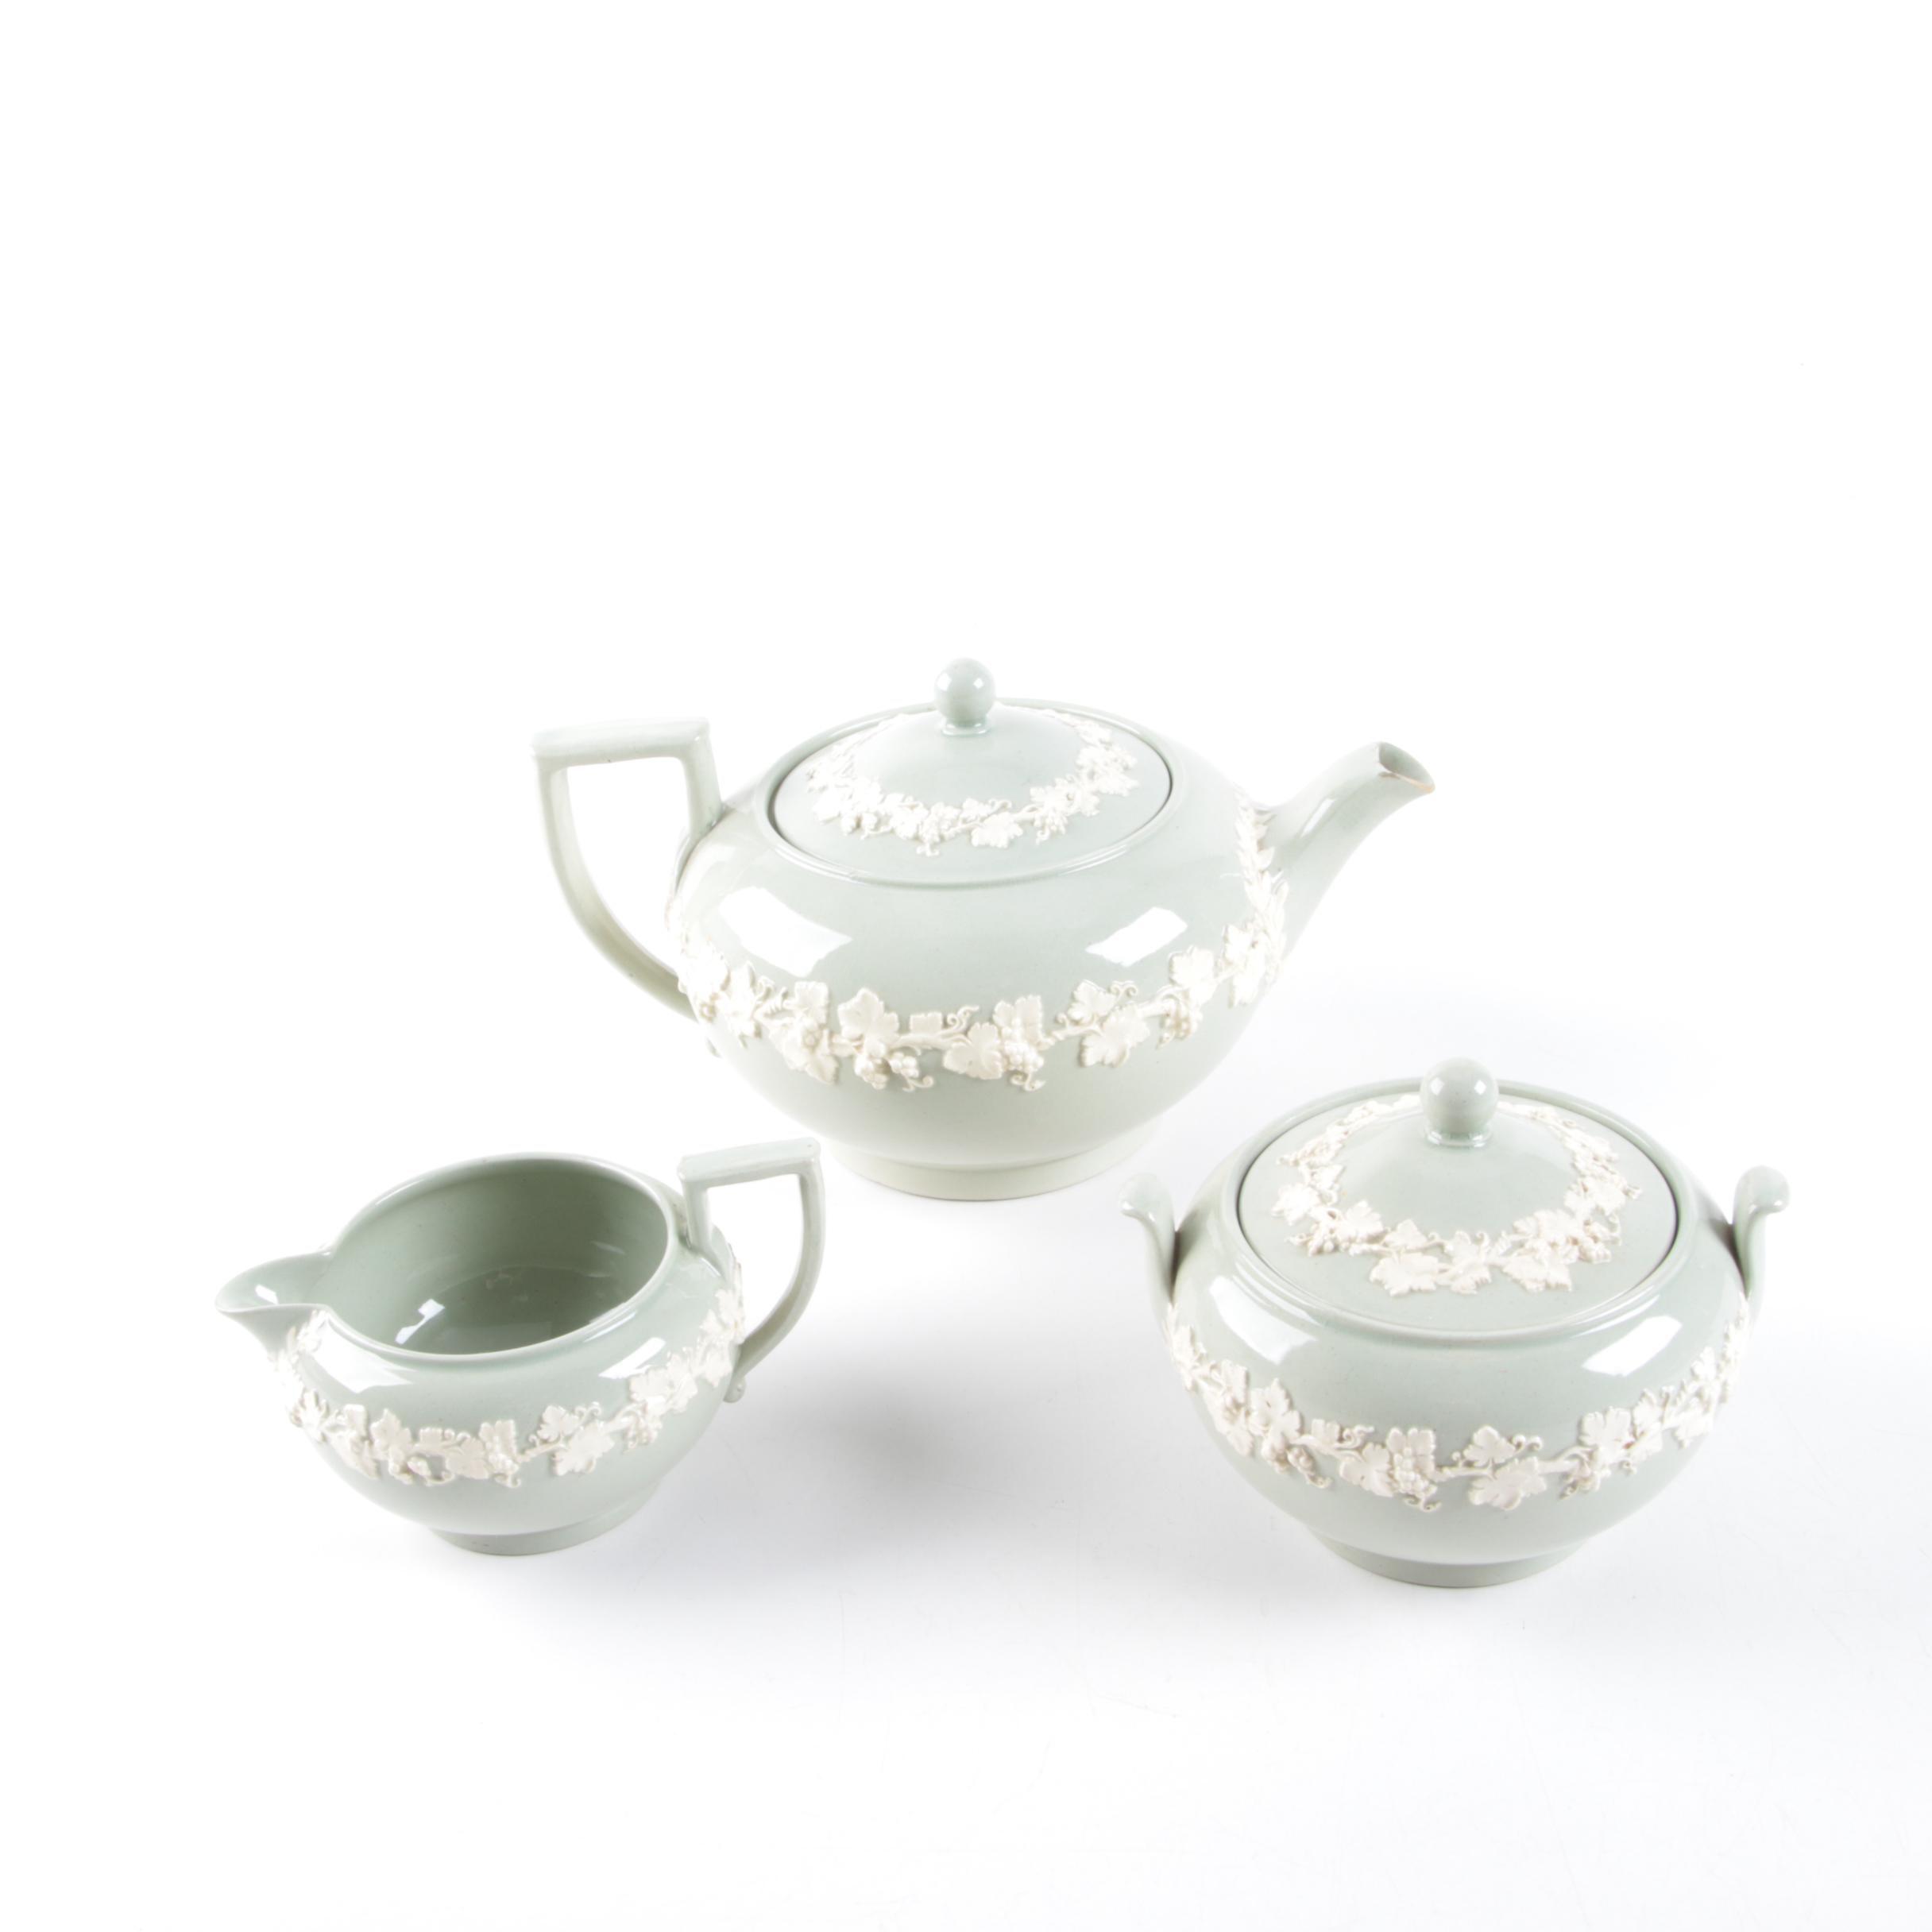 Antique Wedgwood Sage Acanthus Leaf Jasperware Tea Service